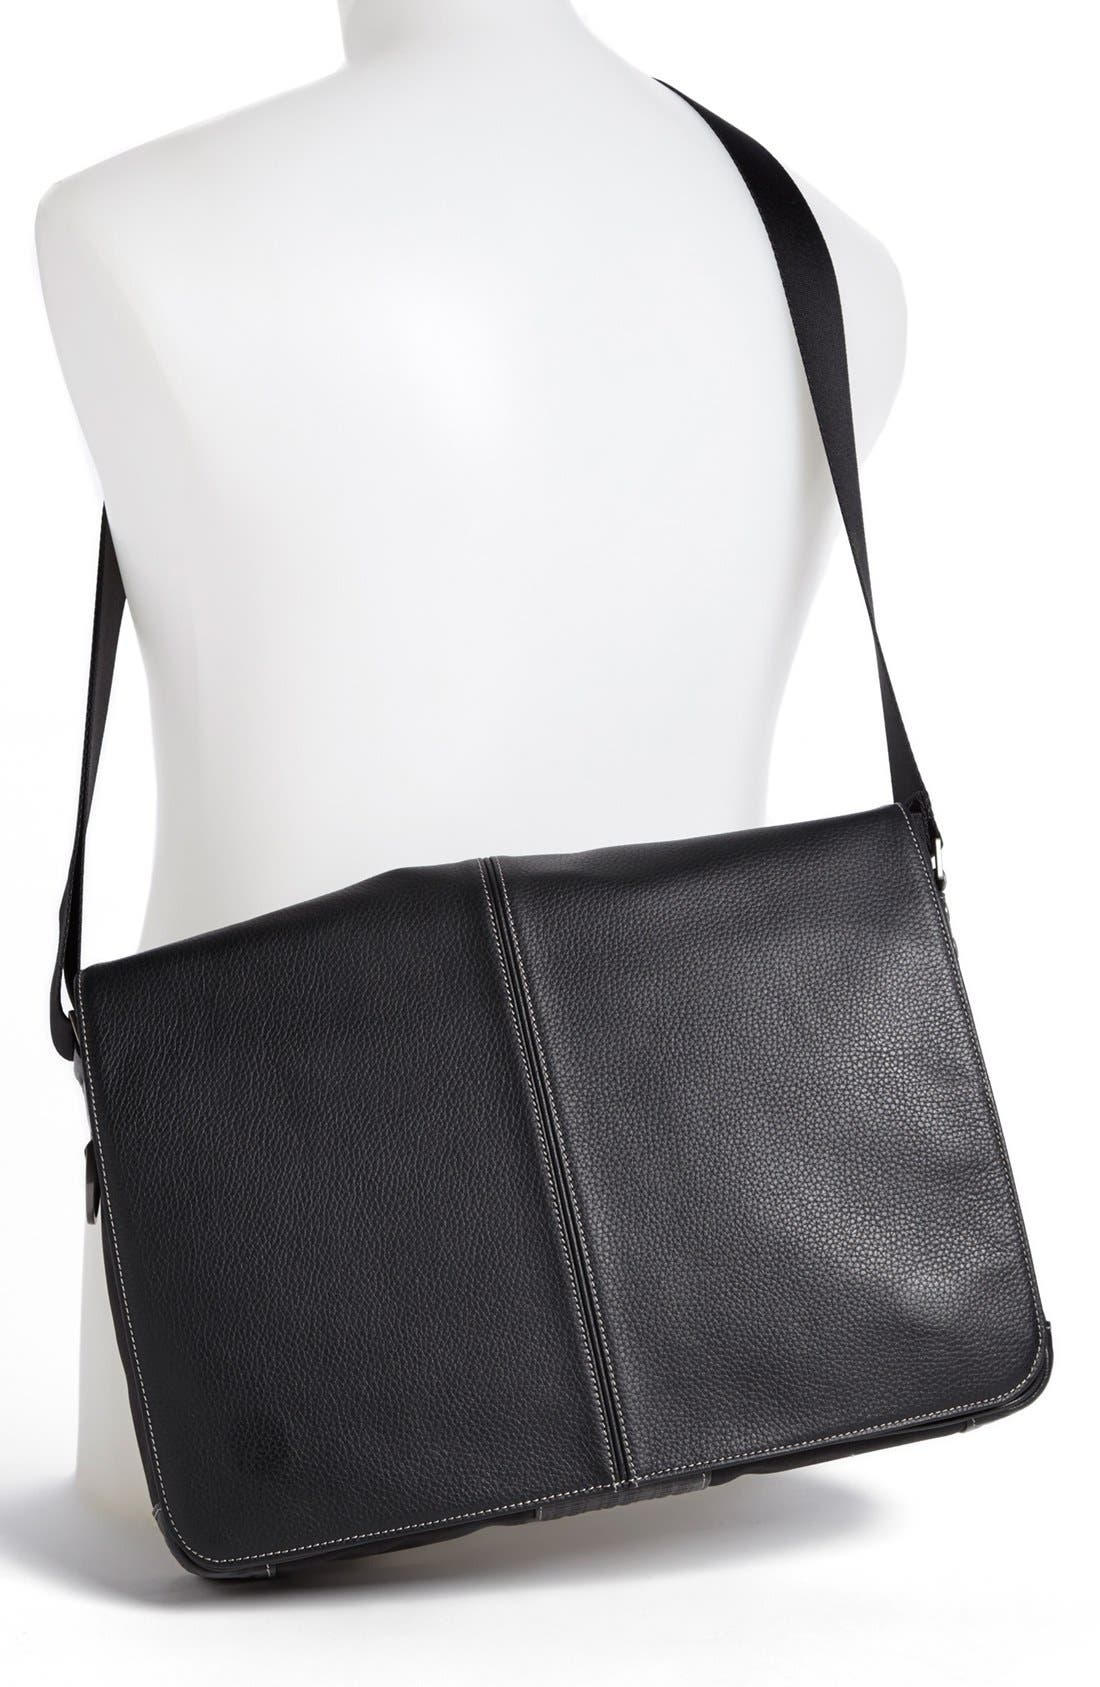 Tyler Slim Leather Laptop Briefcase,                             Alternate thumbnail 2, color,                             Black/ Khaki